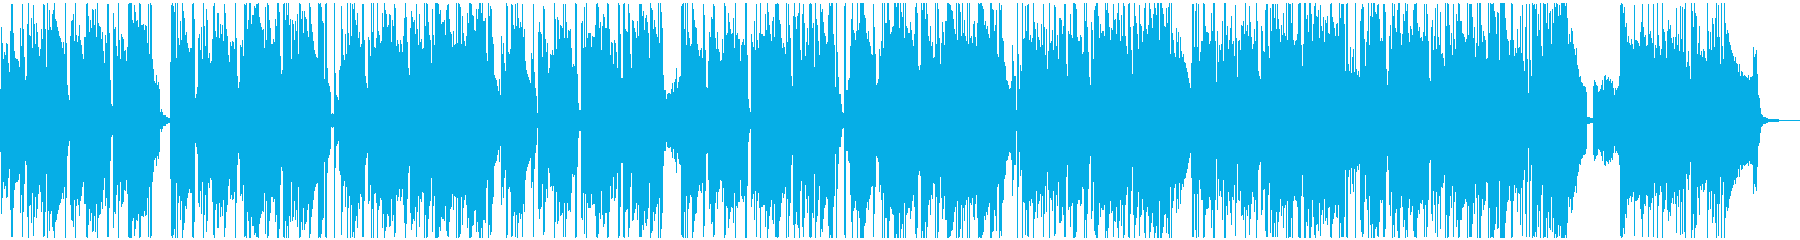 Funky Organ Jammingの再生済みの波形